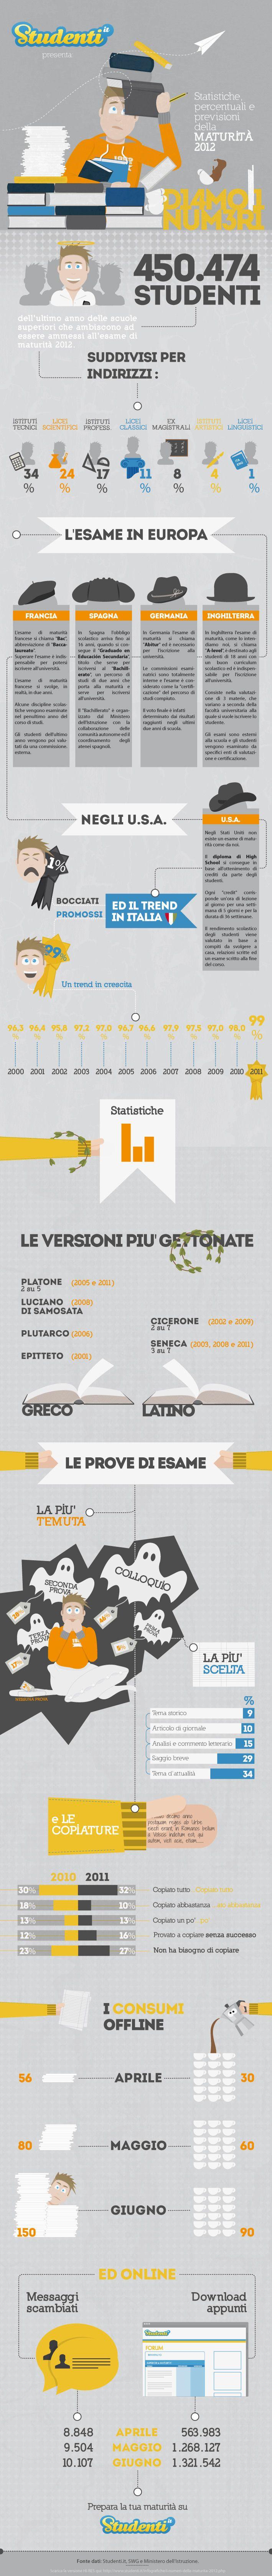 Infografica a cura di Studenti.it - SalvaMaturità